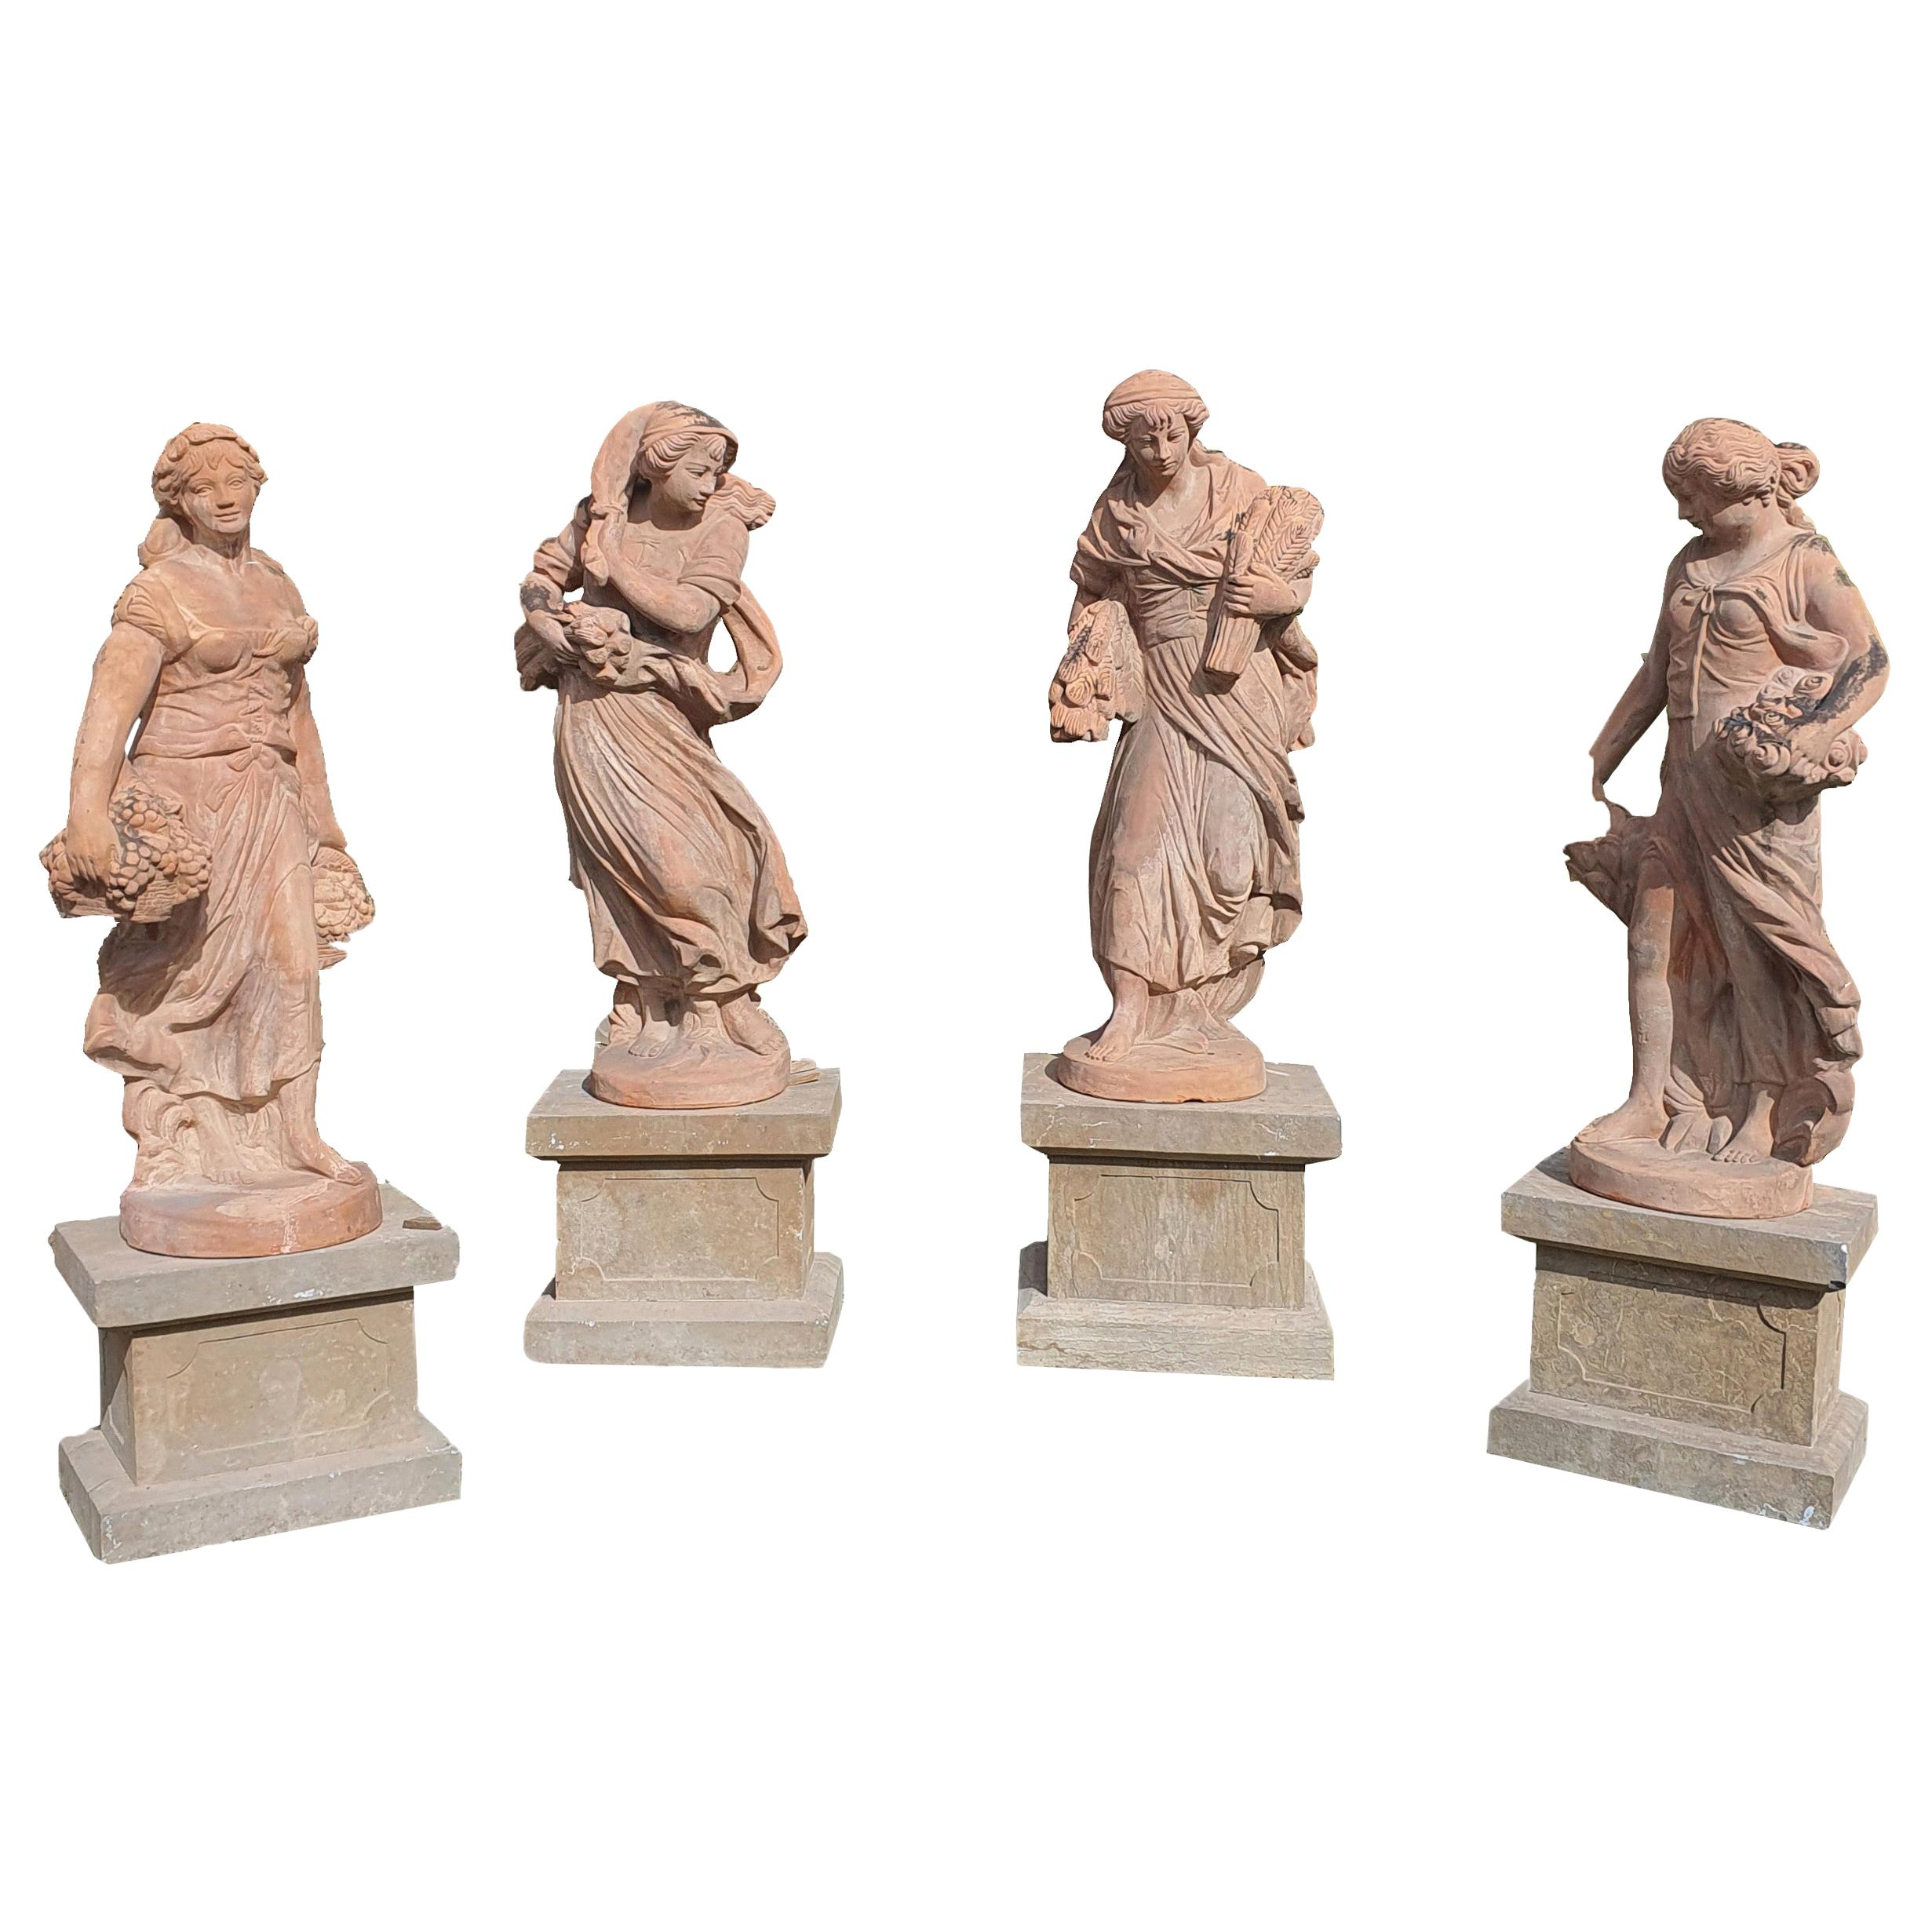 20th Century Italian Sculptures in Terracotta, Four Seasons Statues